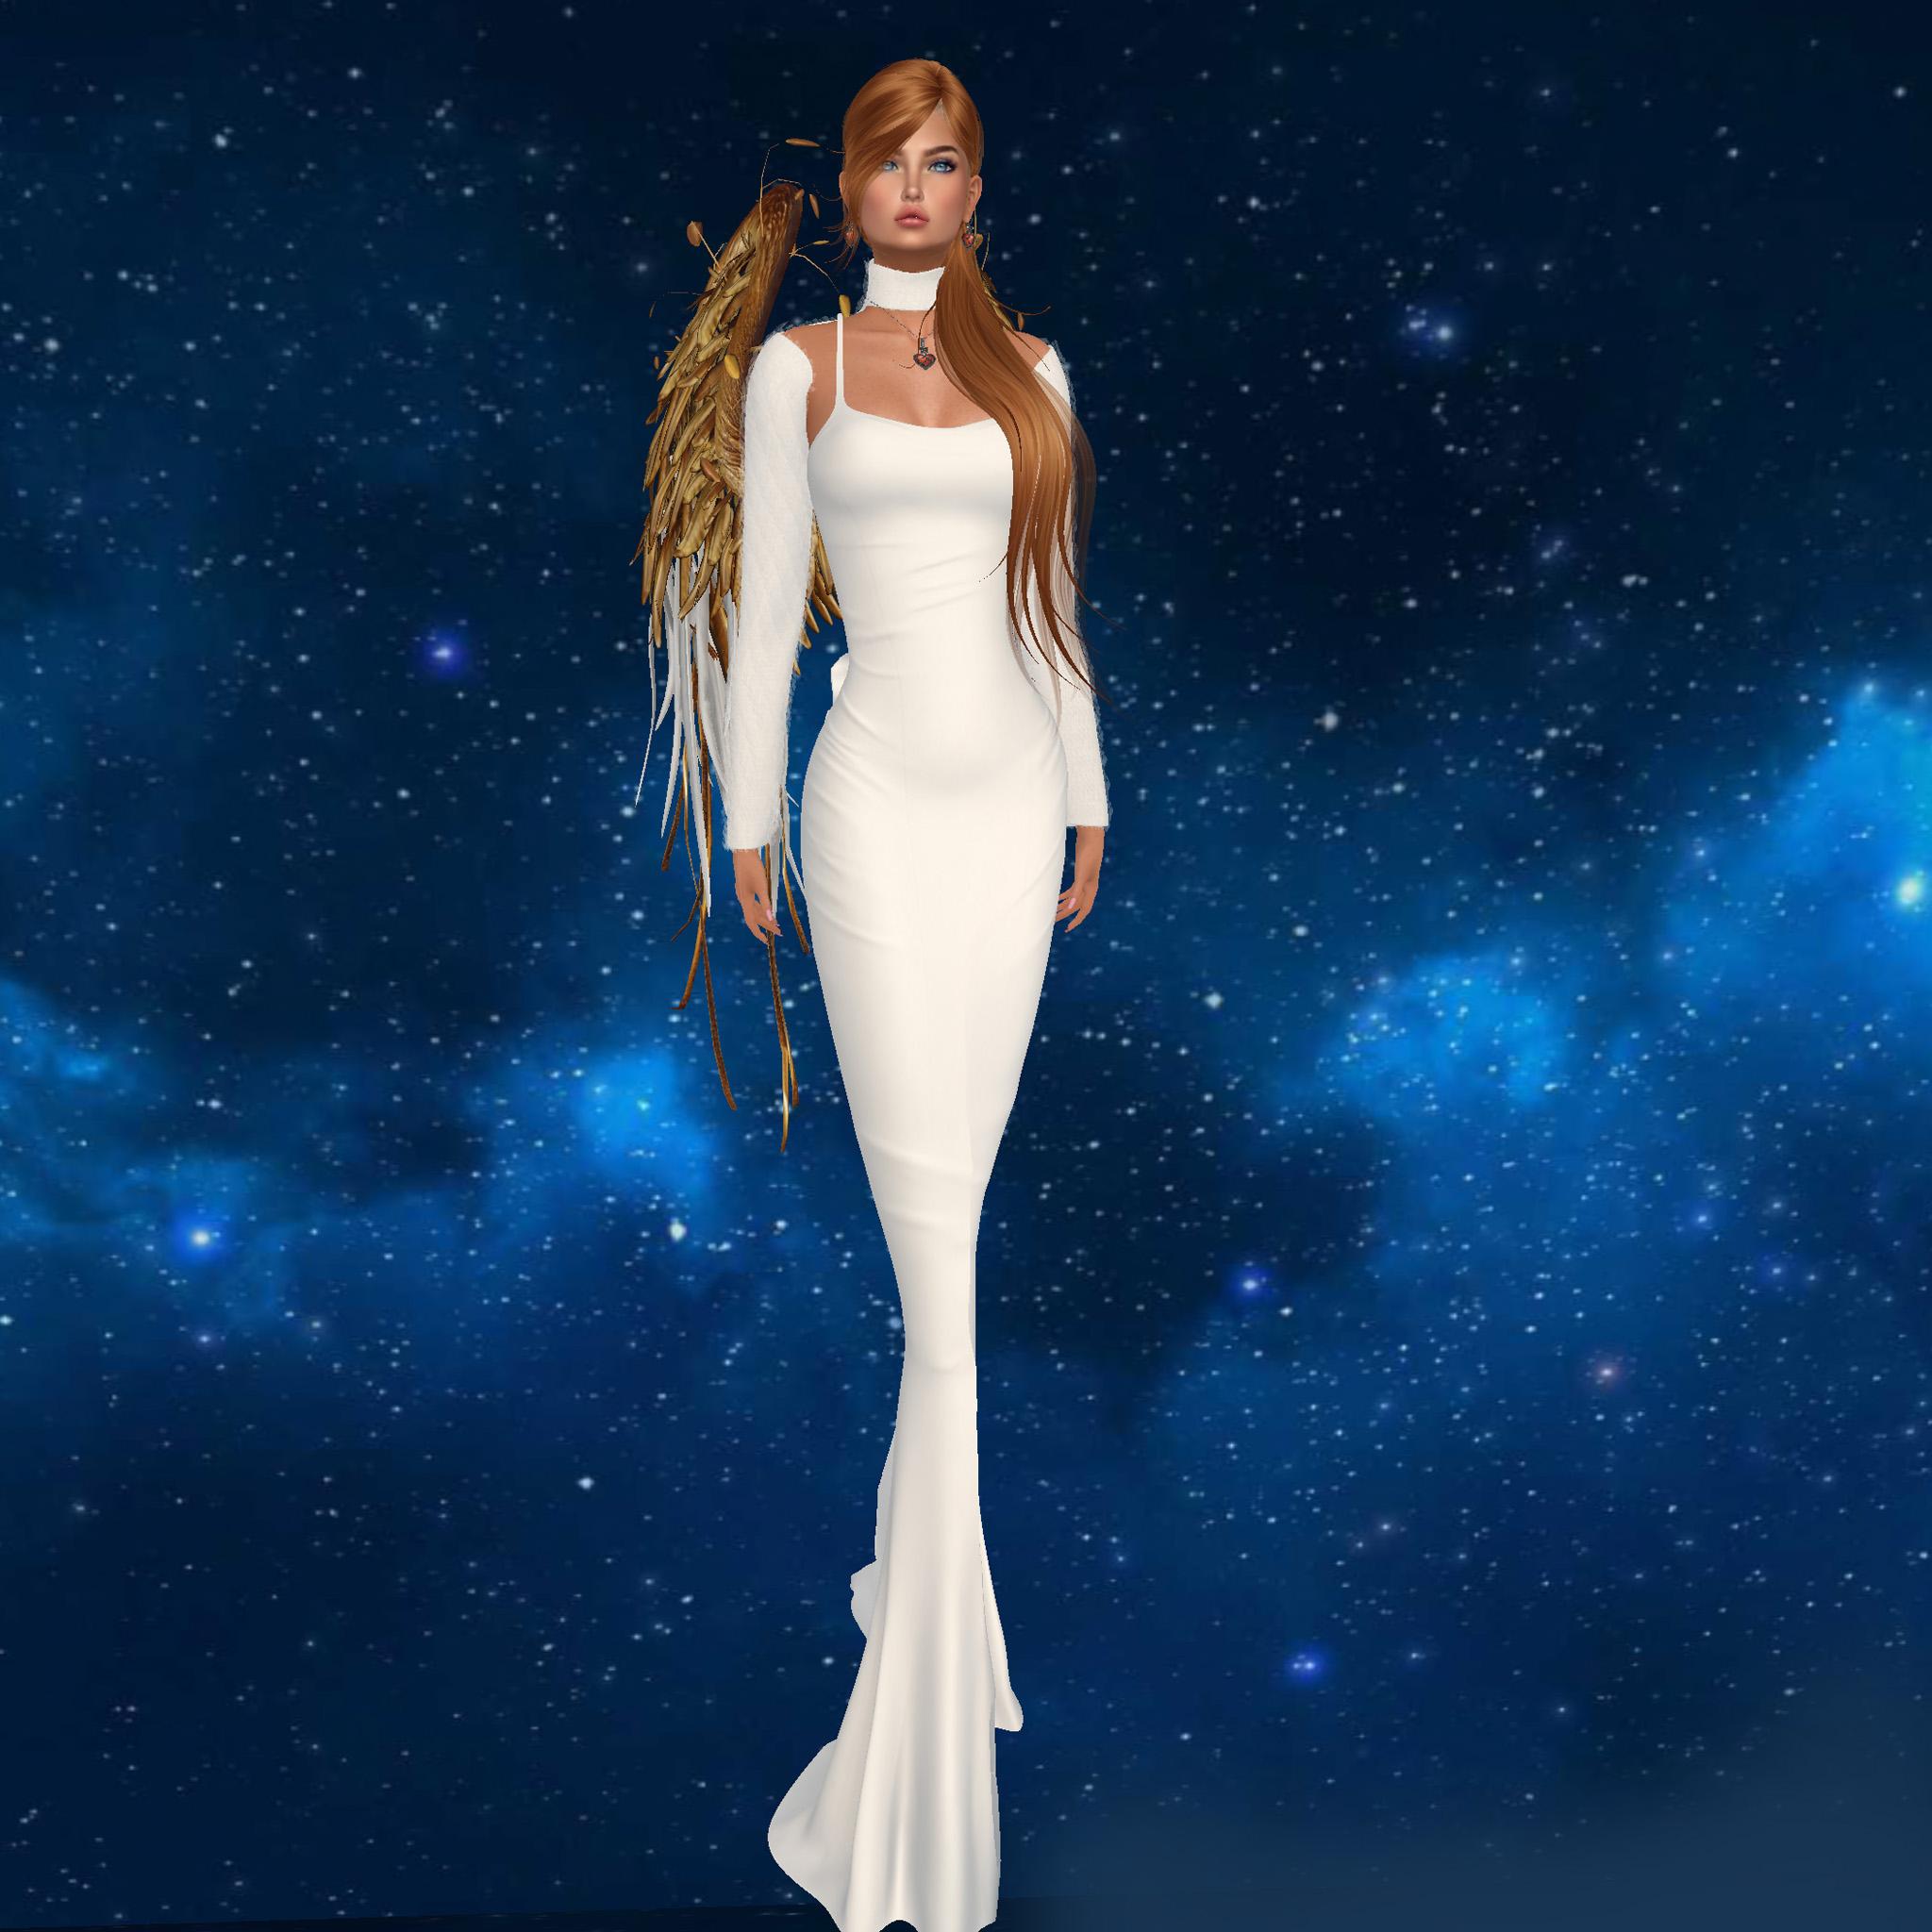 A VALENTINE ANGEL 3